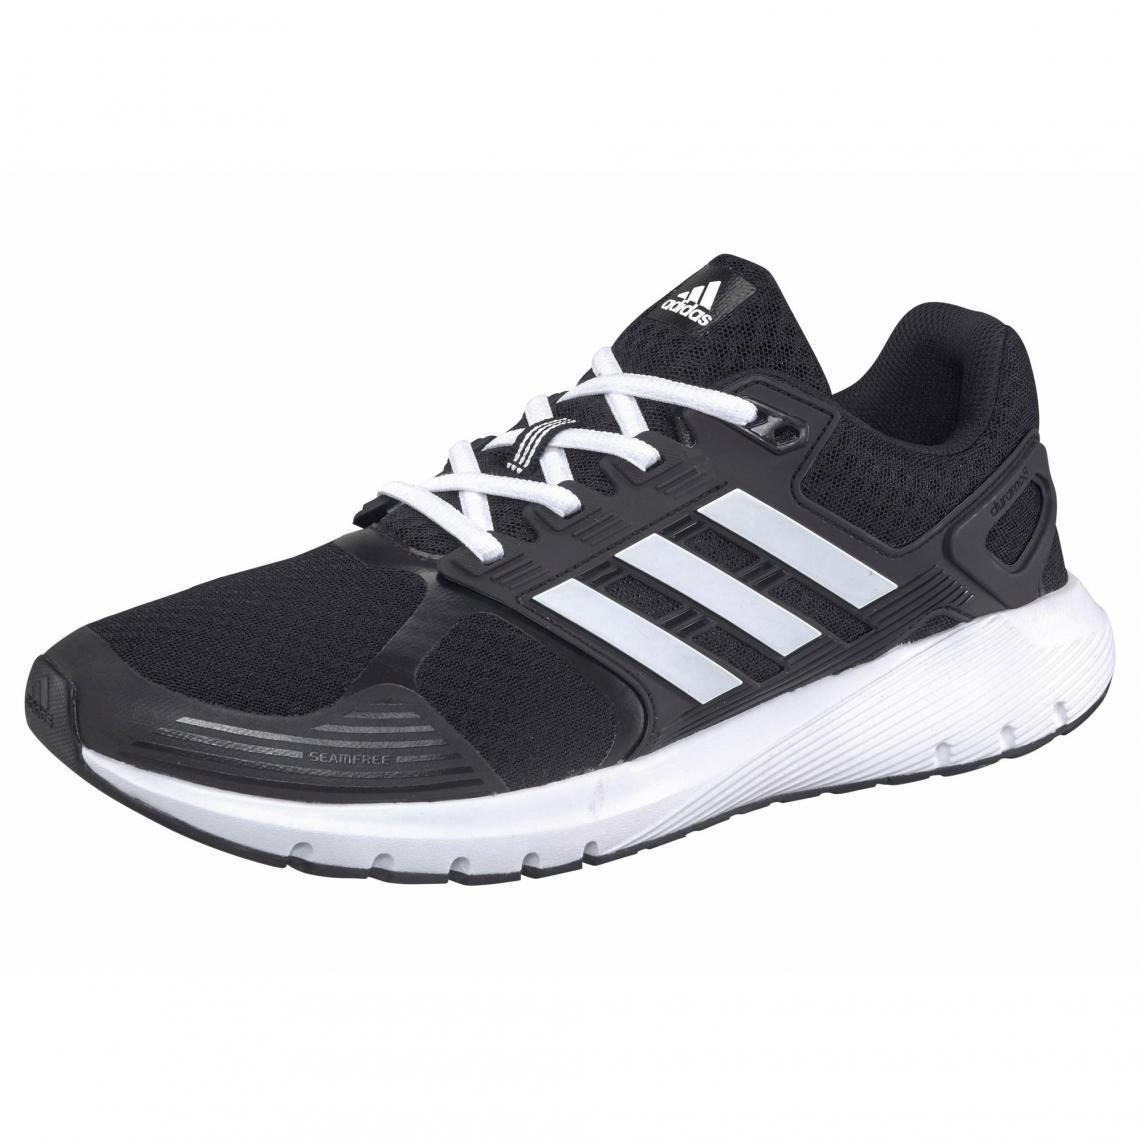 wholesale dealer 2e140 9f6e7 adidas Performance Duramo 8 chaussures de running homme - Noir - Blanc  Adidas Performance Homme